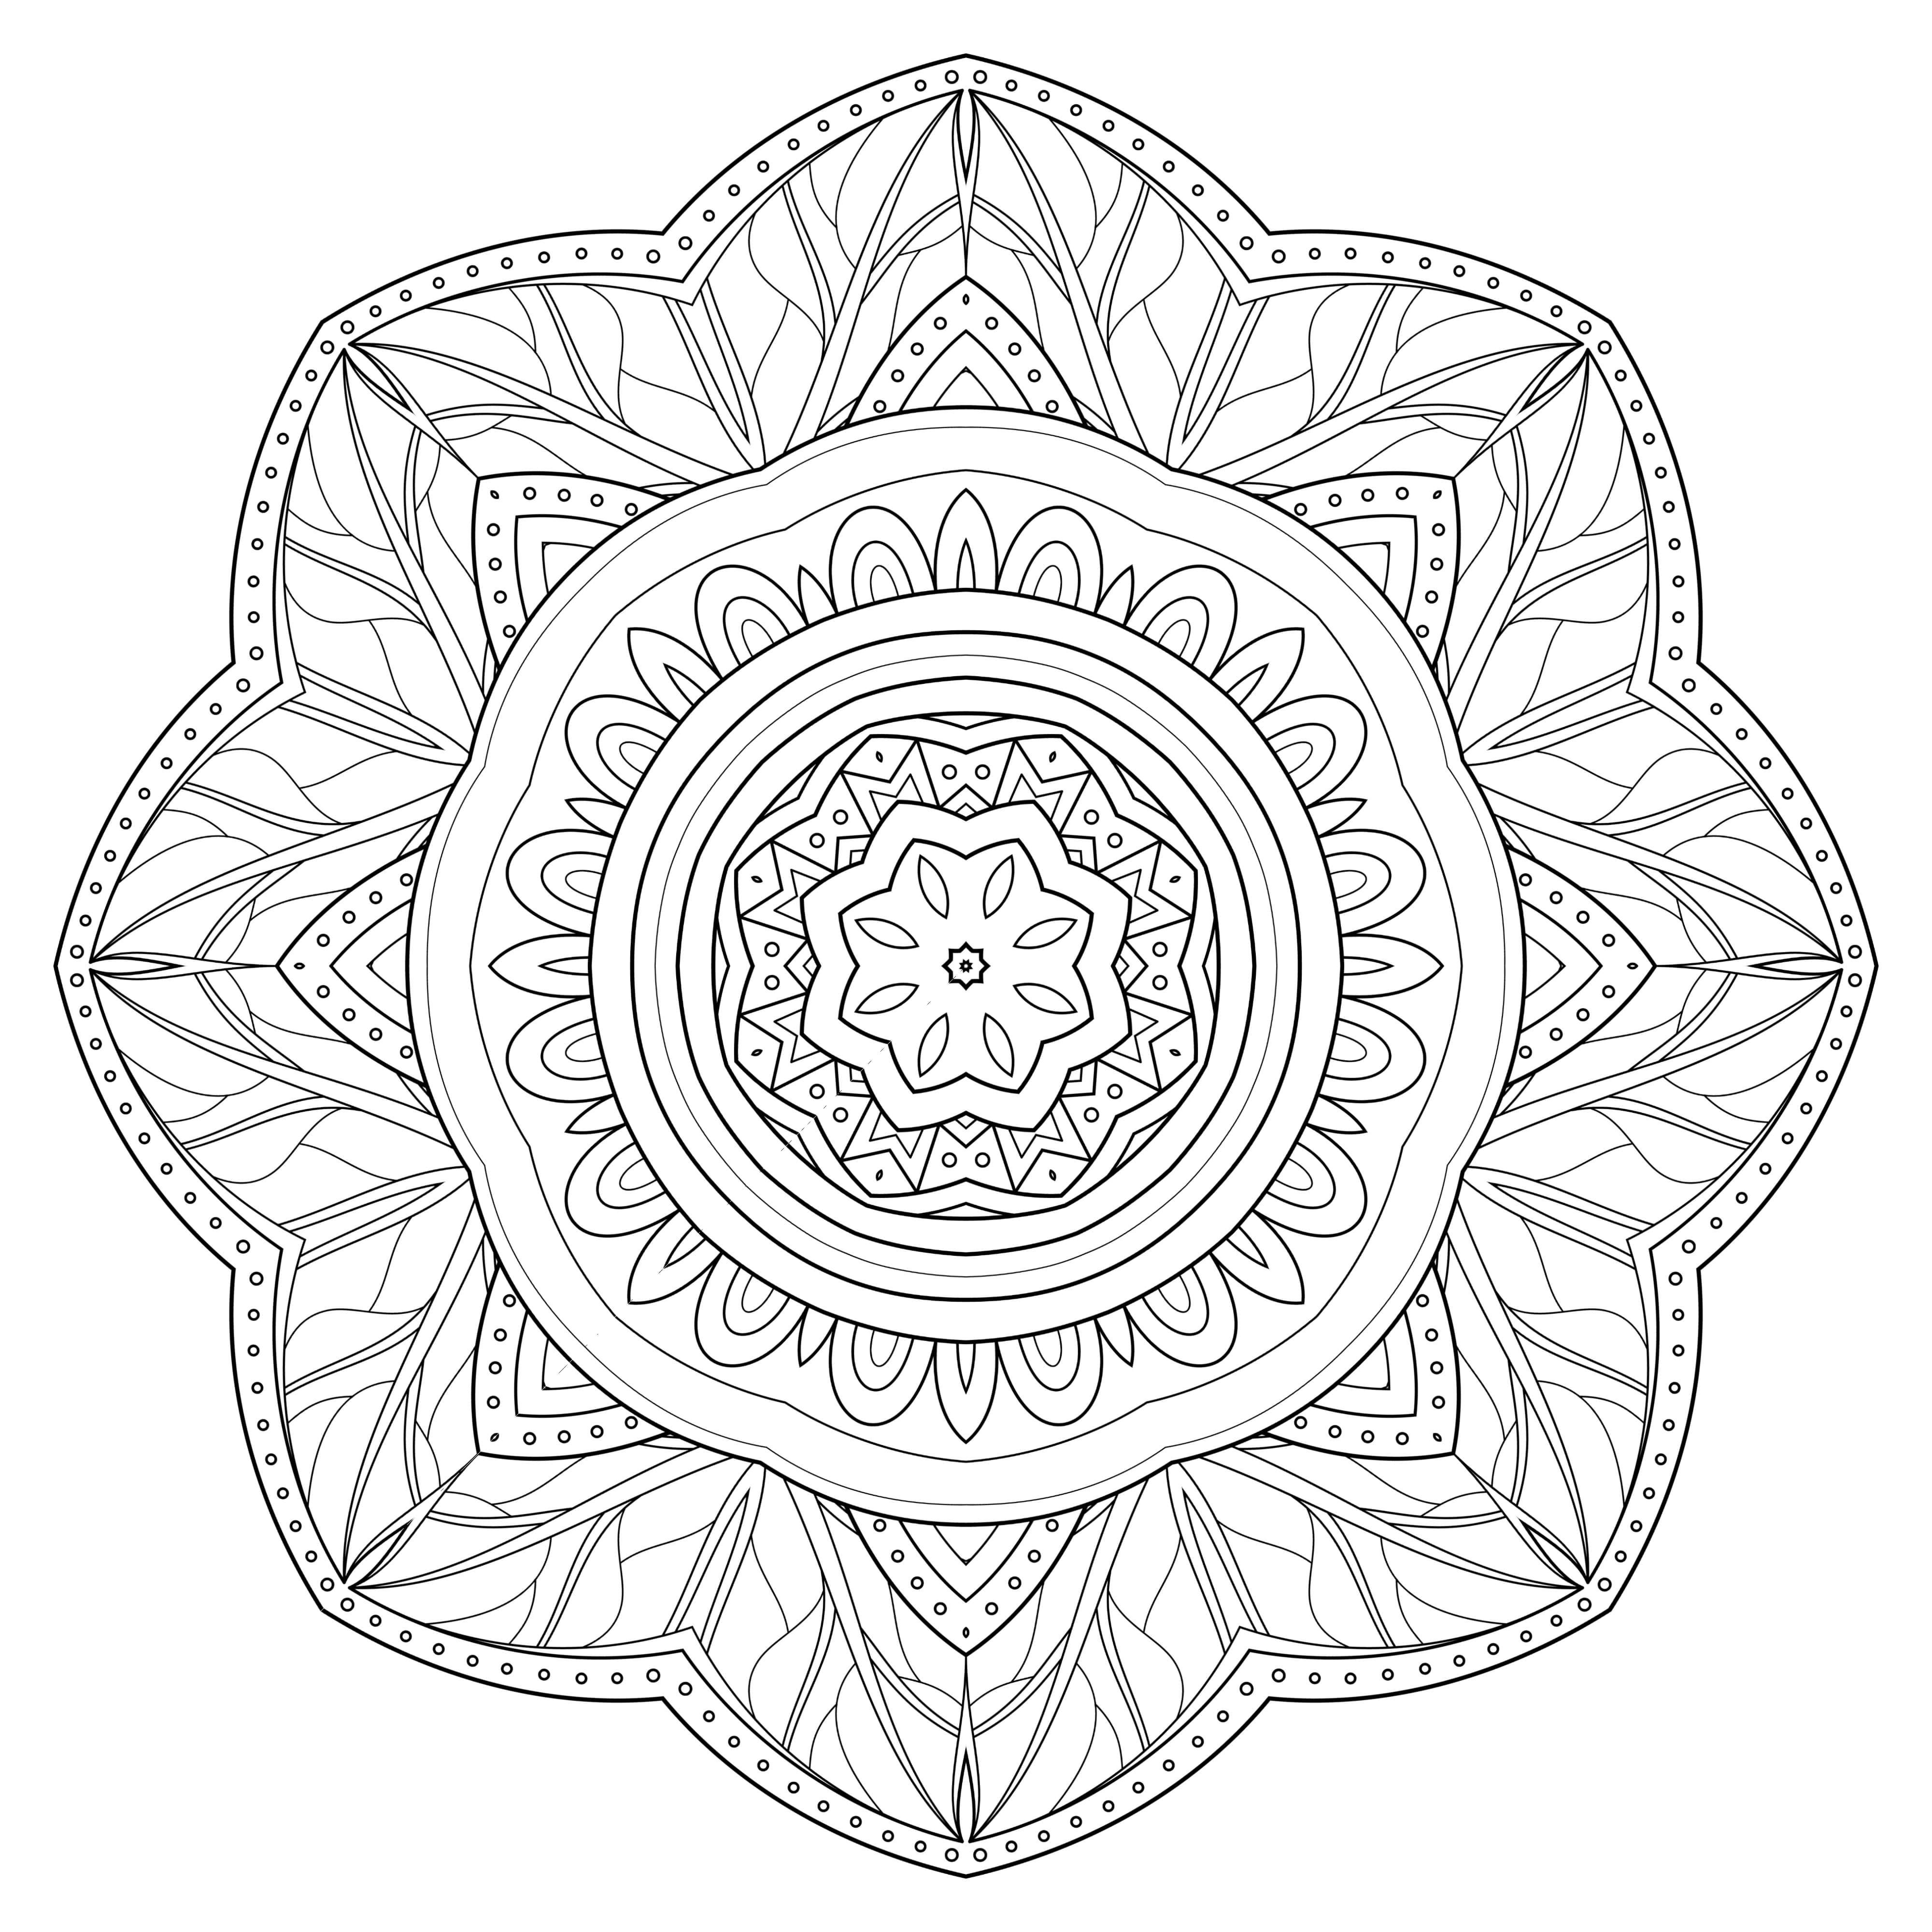 5 Free Printable Coloring Pages: Mandala Templates | Free Printable - Free Printable Mandala Patterns